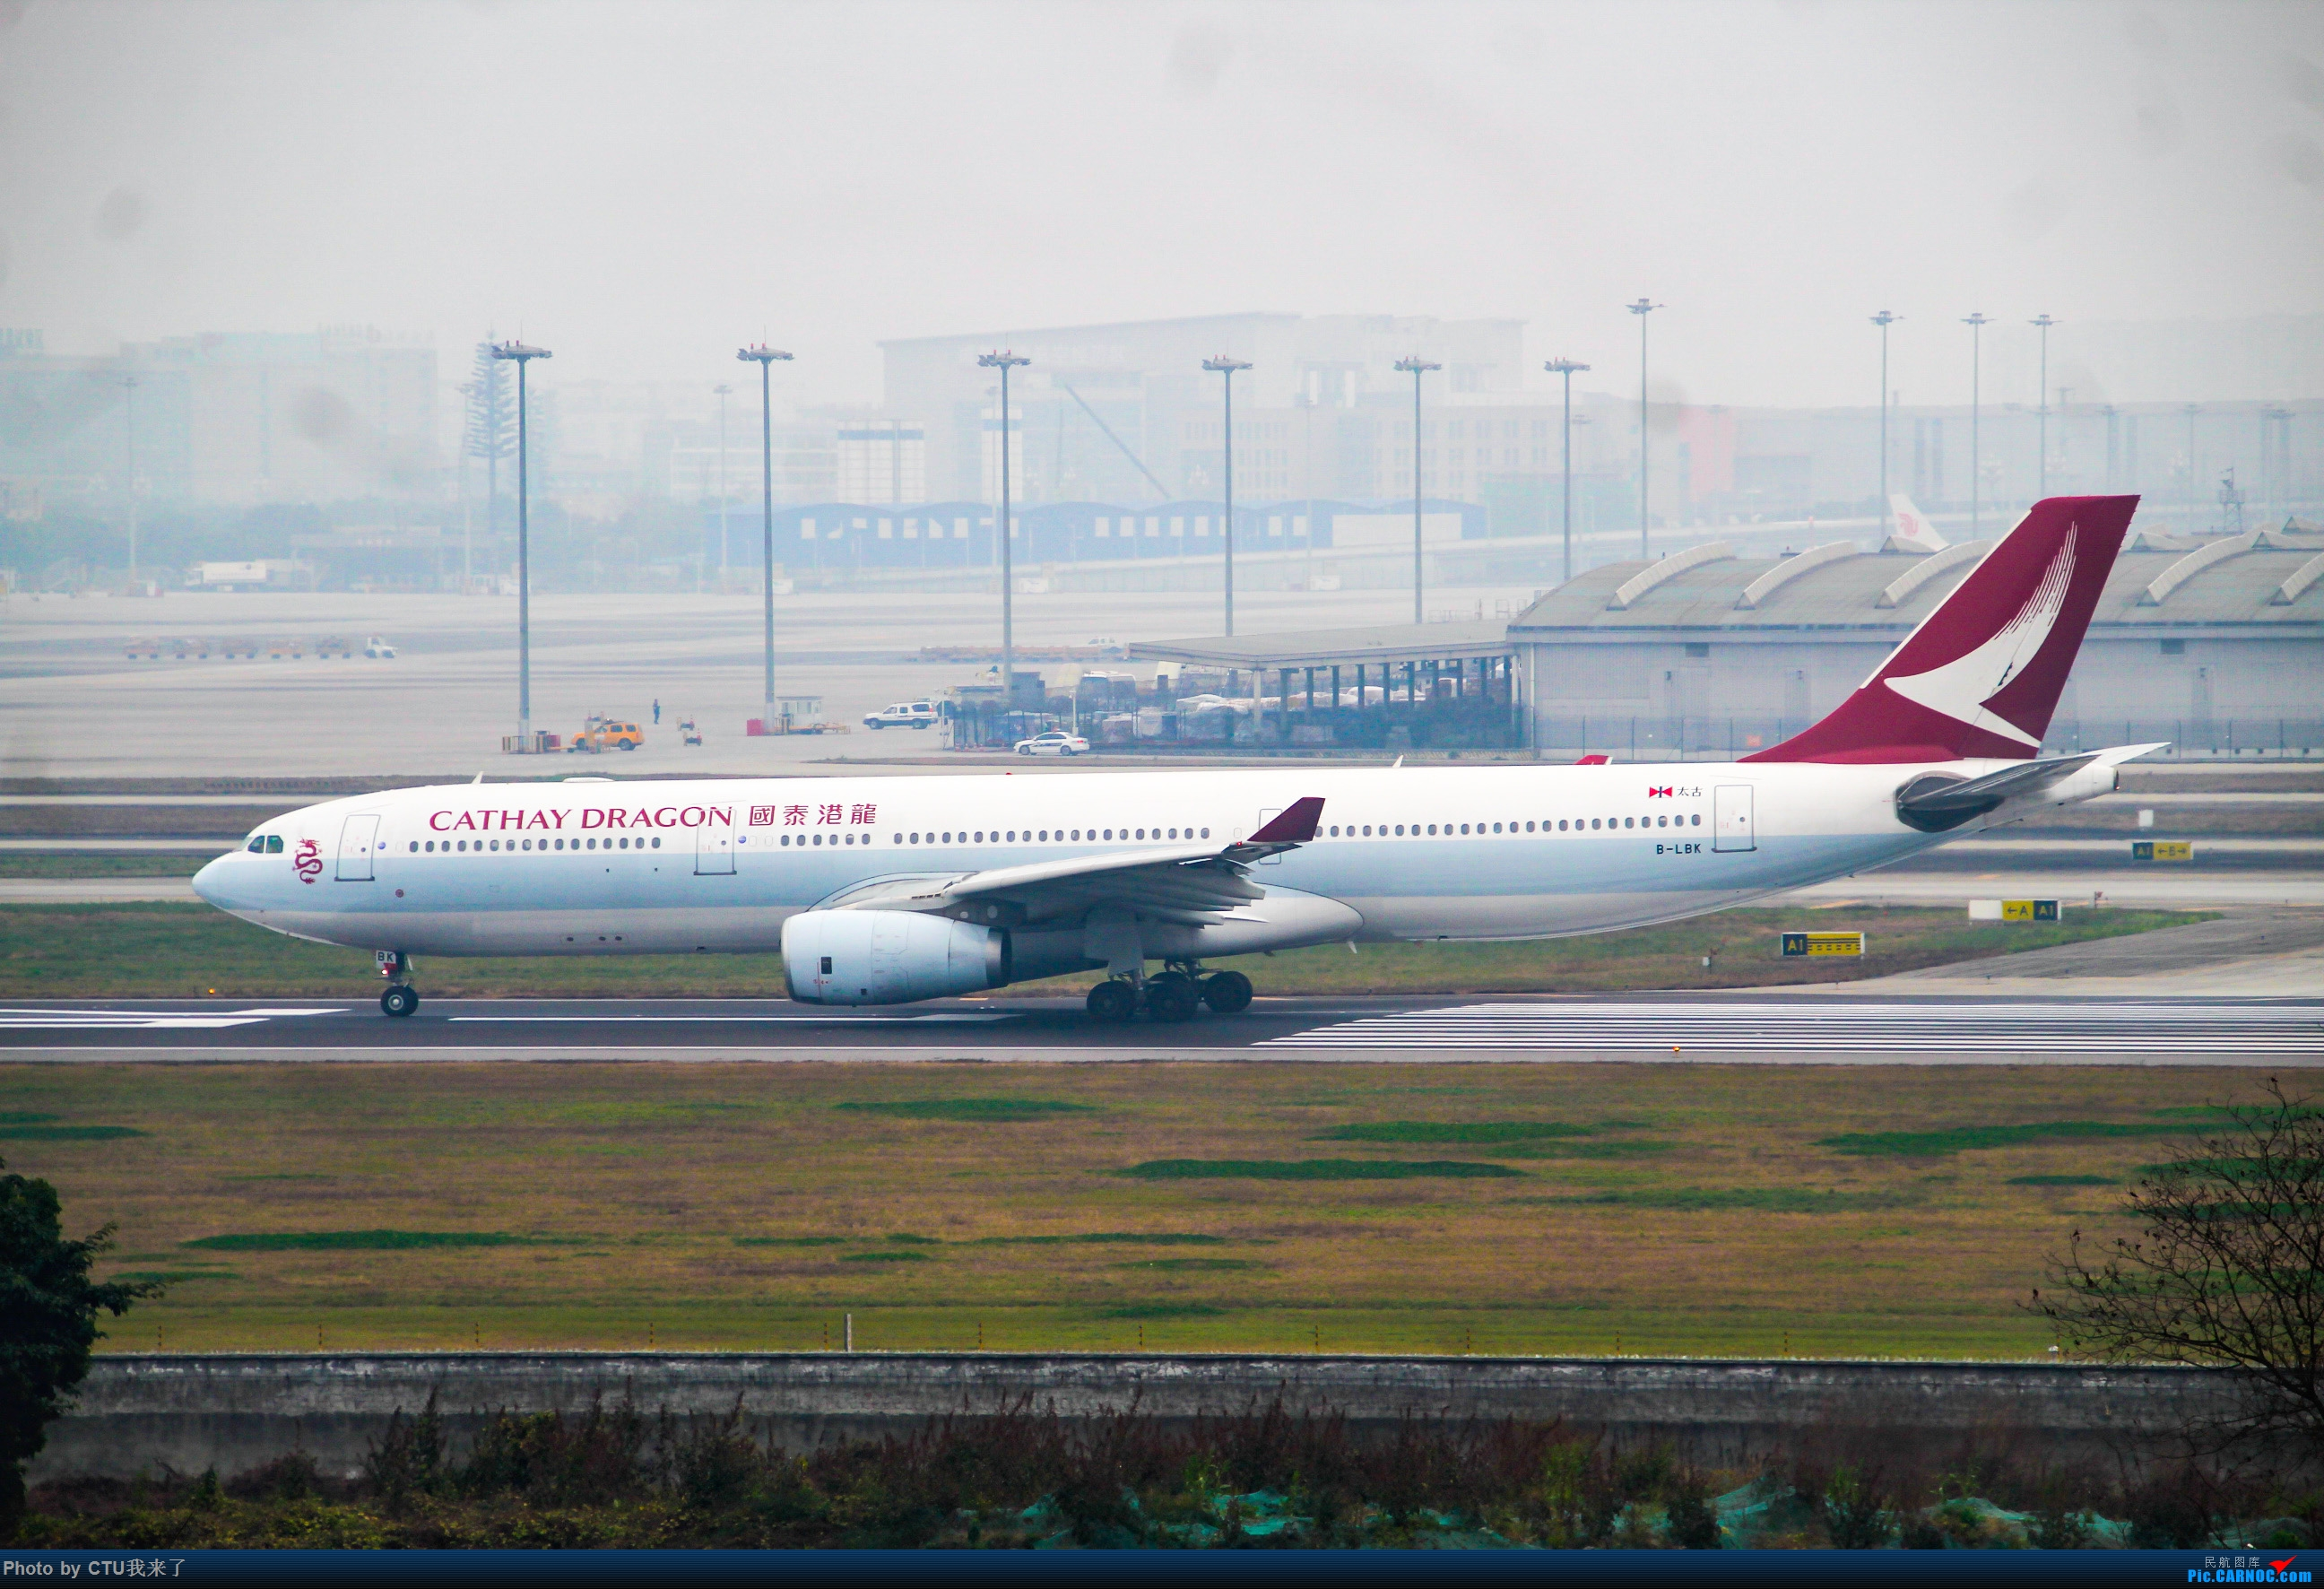 Re:[原创]CTU水泥天拍机,验证烂天好货的铁律 AIRBUS A330-300 B-LBK 中国成都双流国际机场